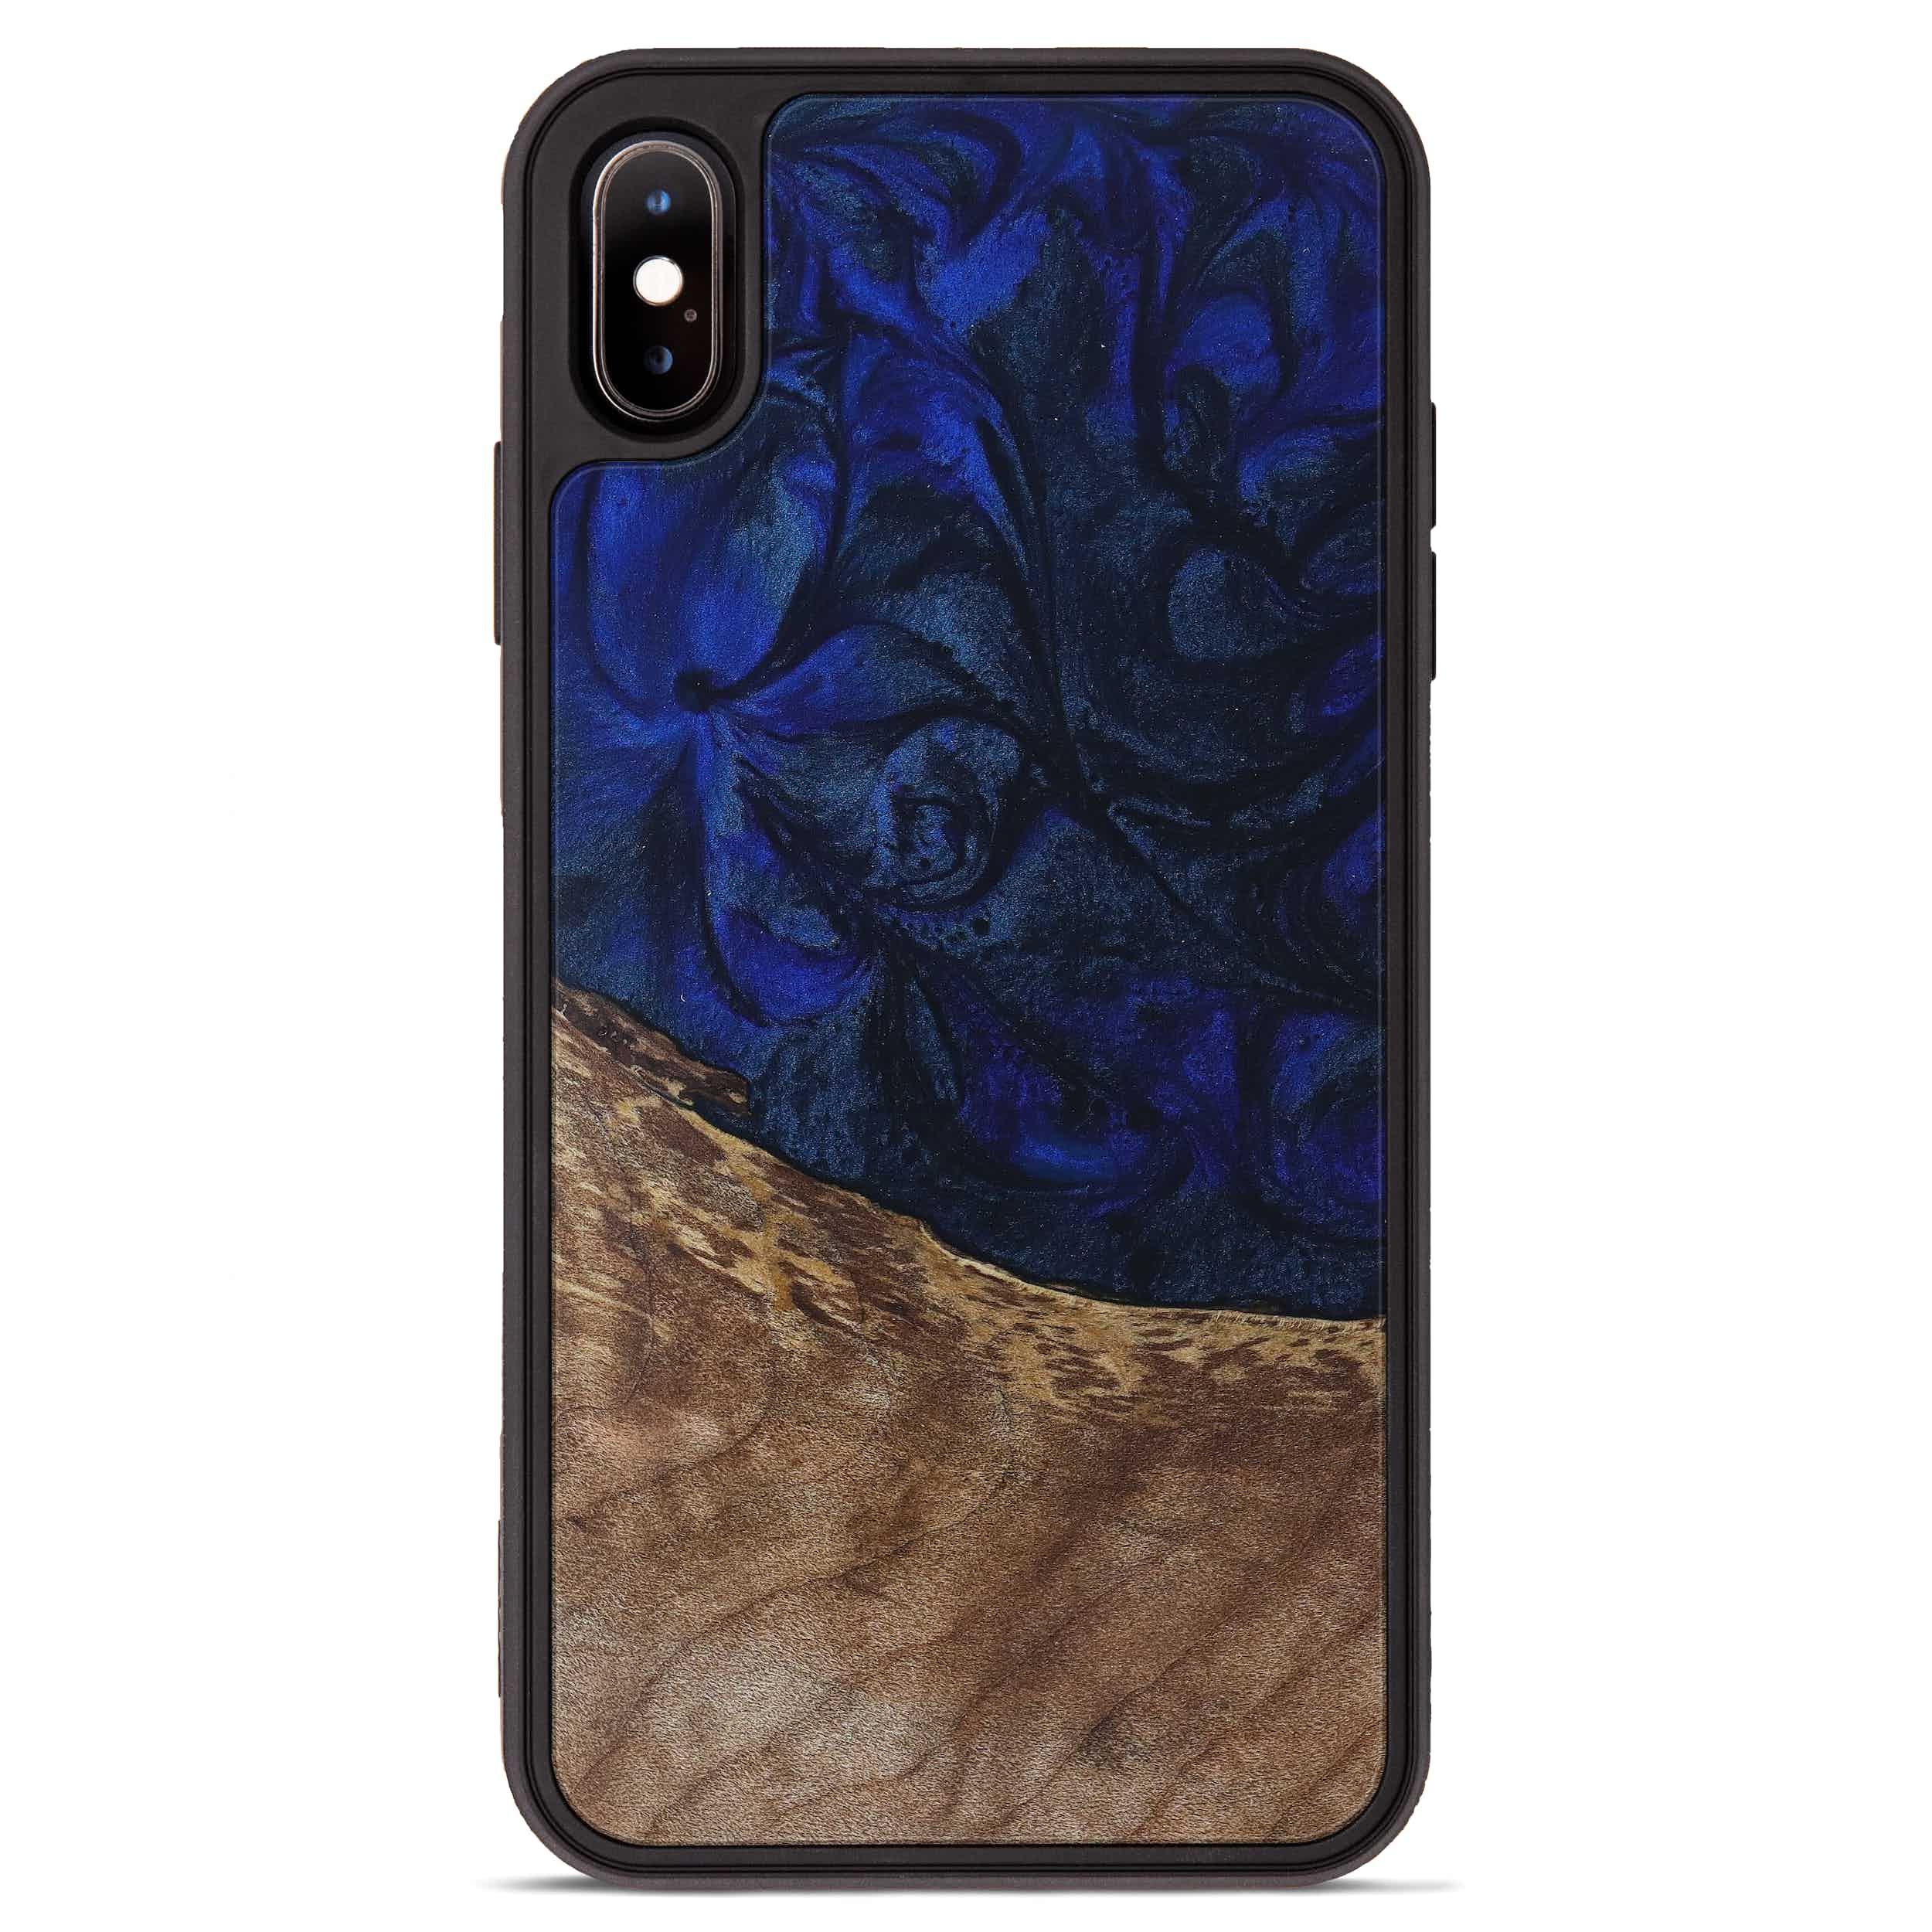 iPhone Xs Max Wood+Resin Phone Case - Xavier (Dark Blue, 397877)